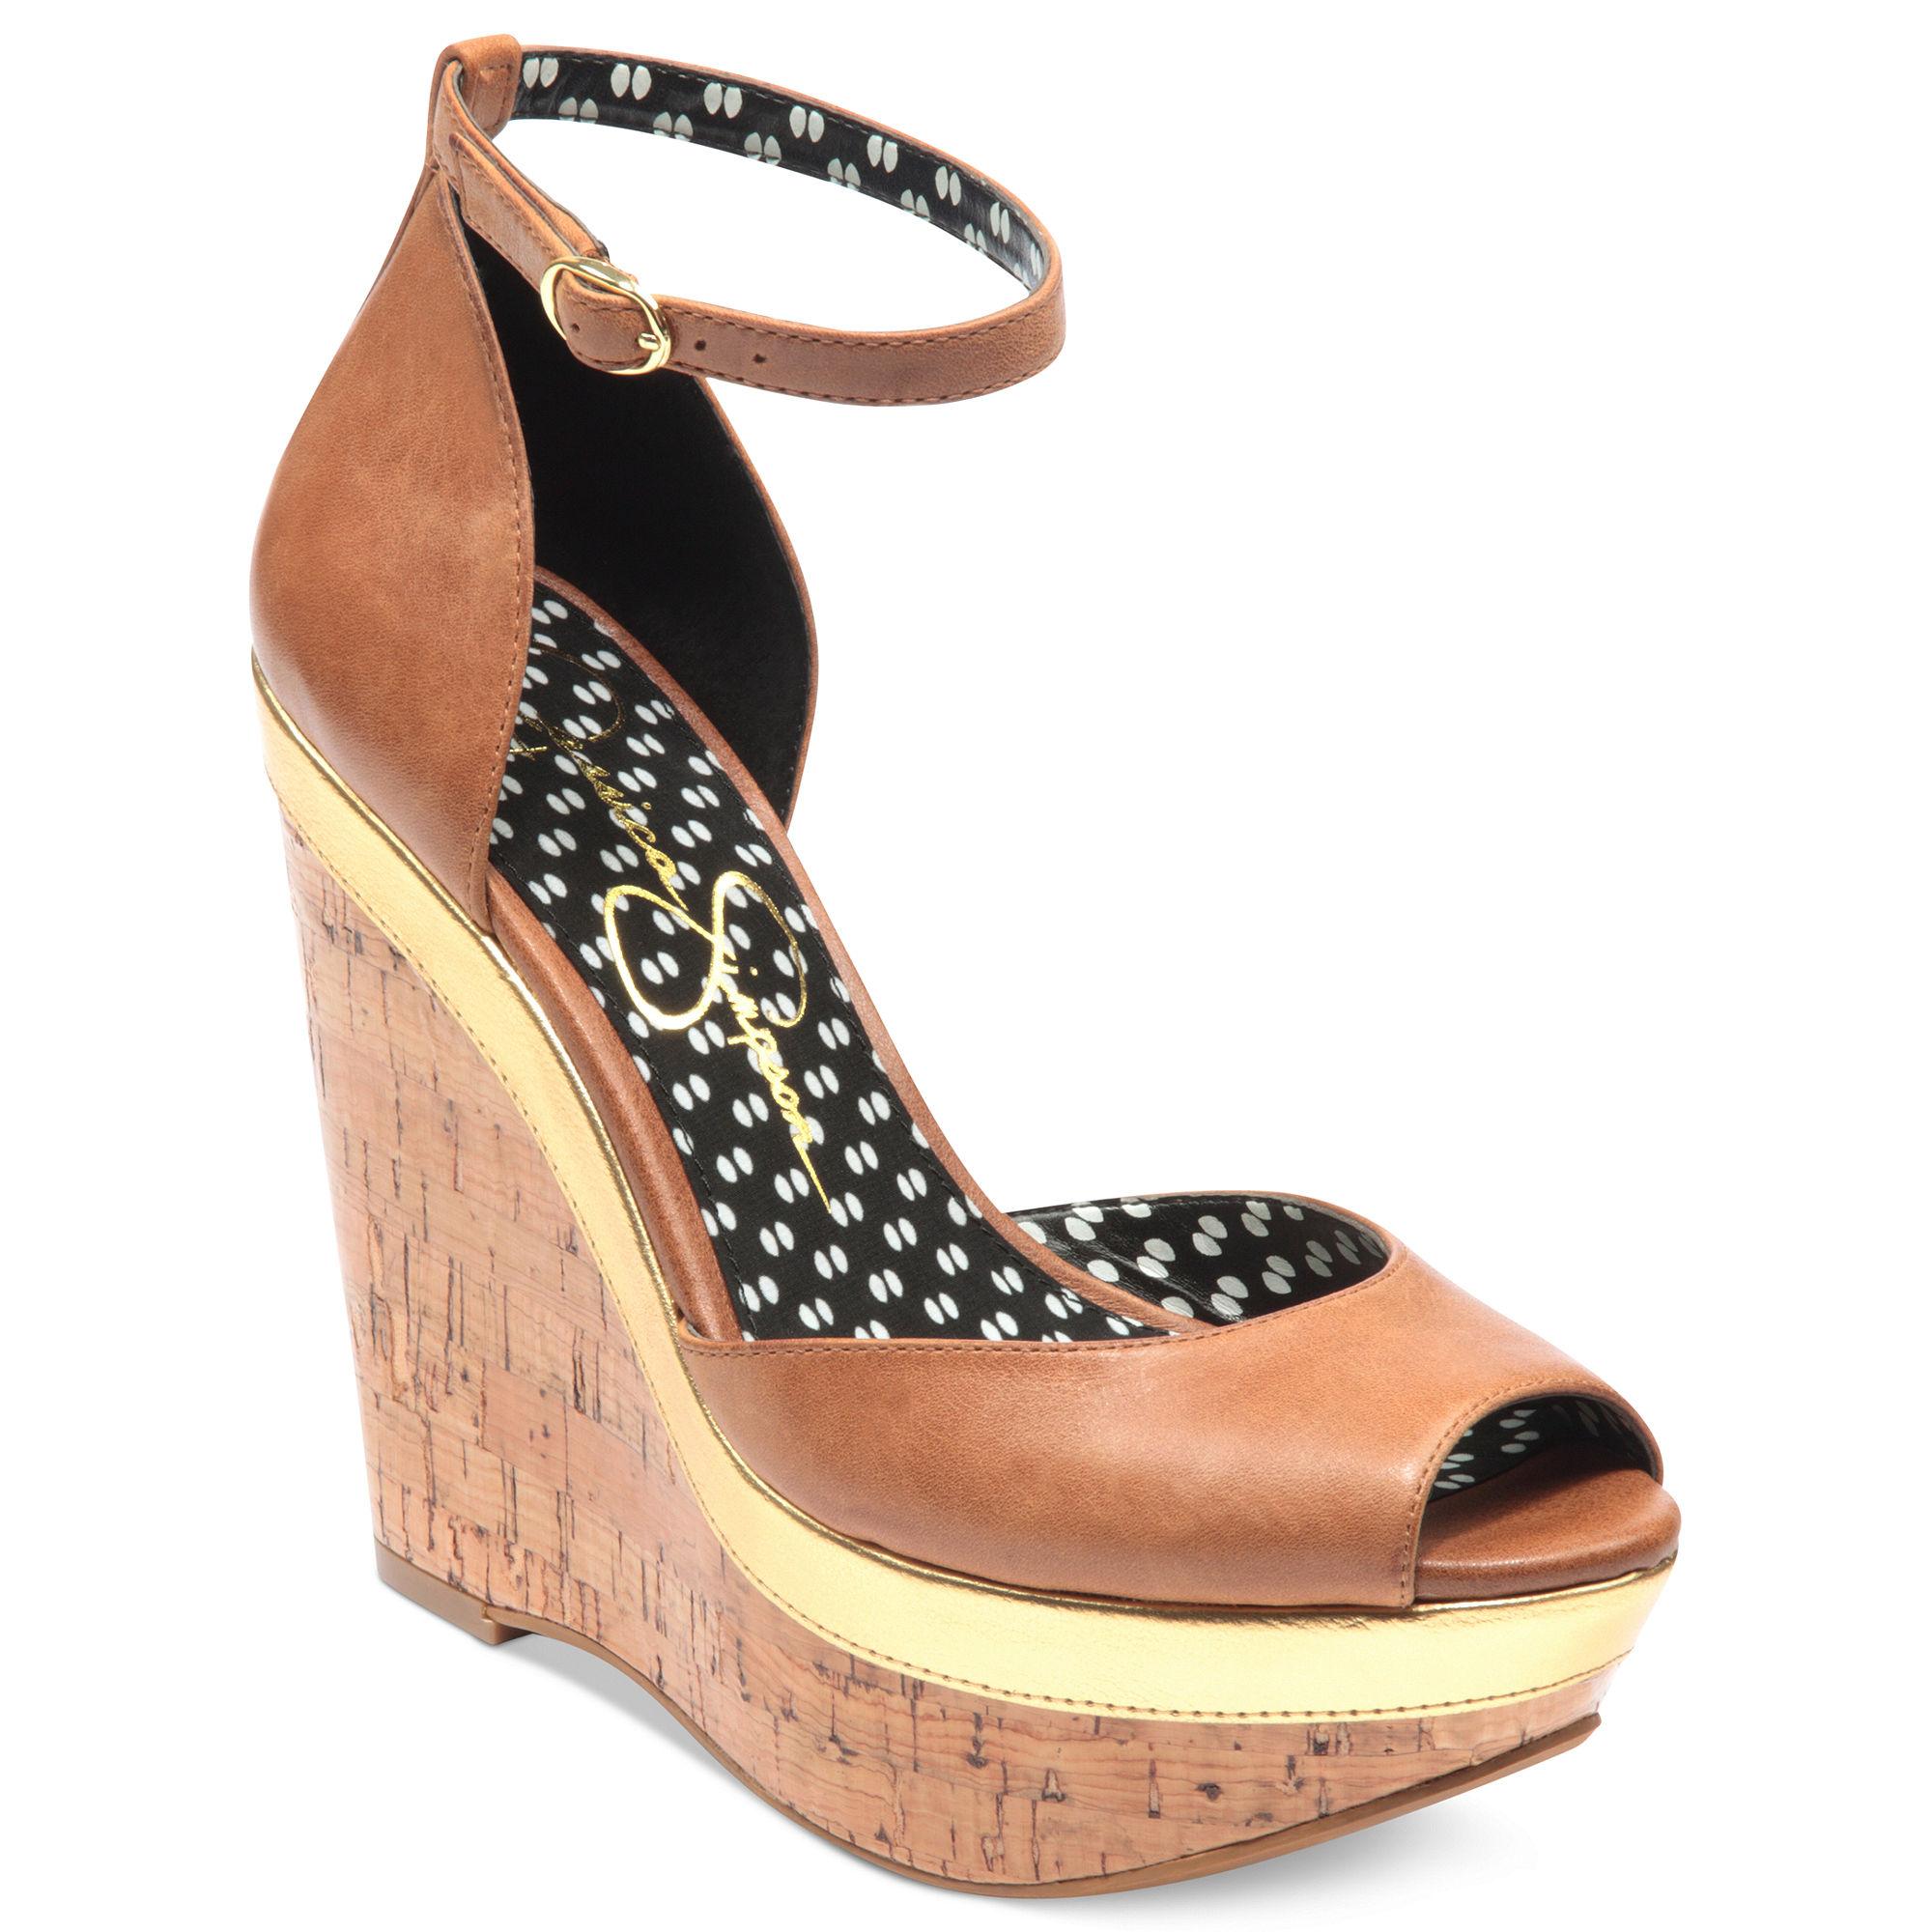 cc03dffc4e09 Lyst jessica simpson keira platform wedge sandals in brown jpg 2000x2000 Jessica  simpson tan wedges